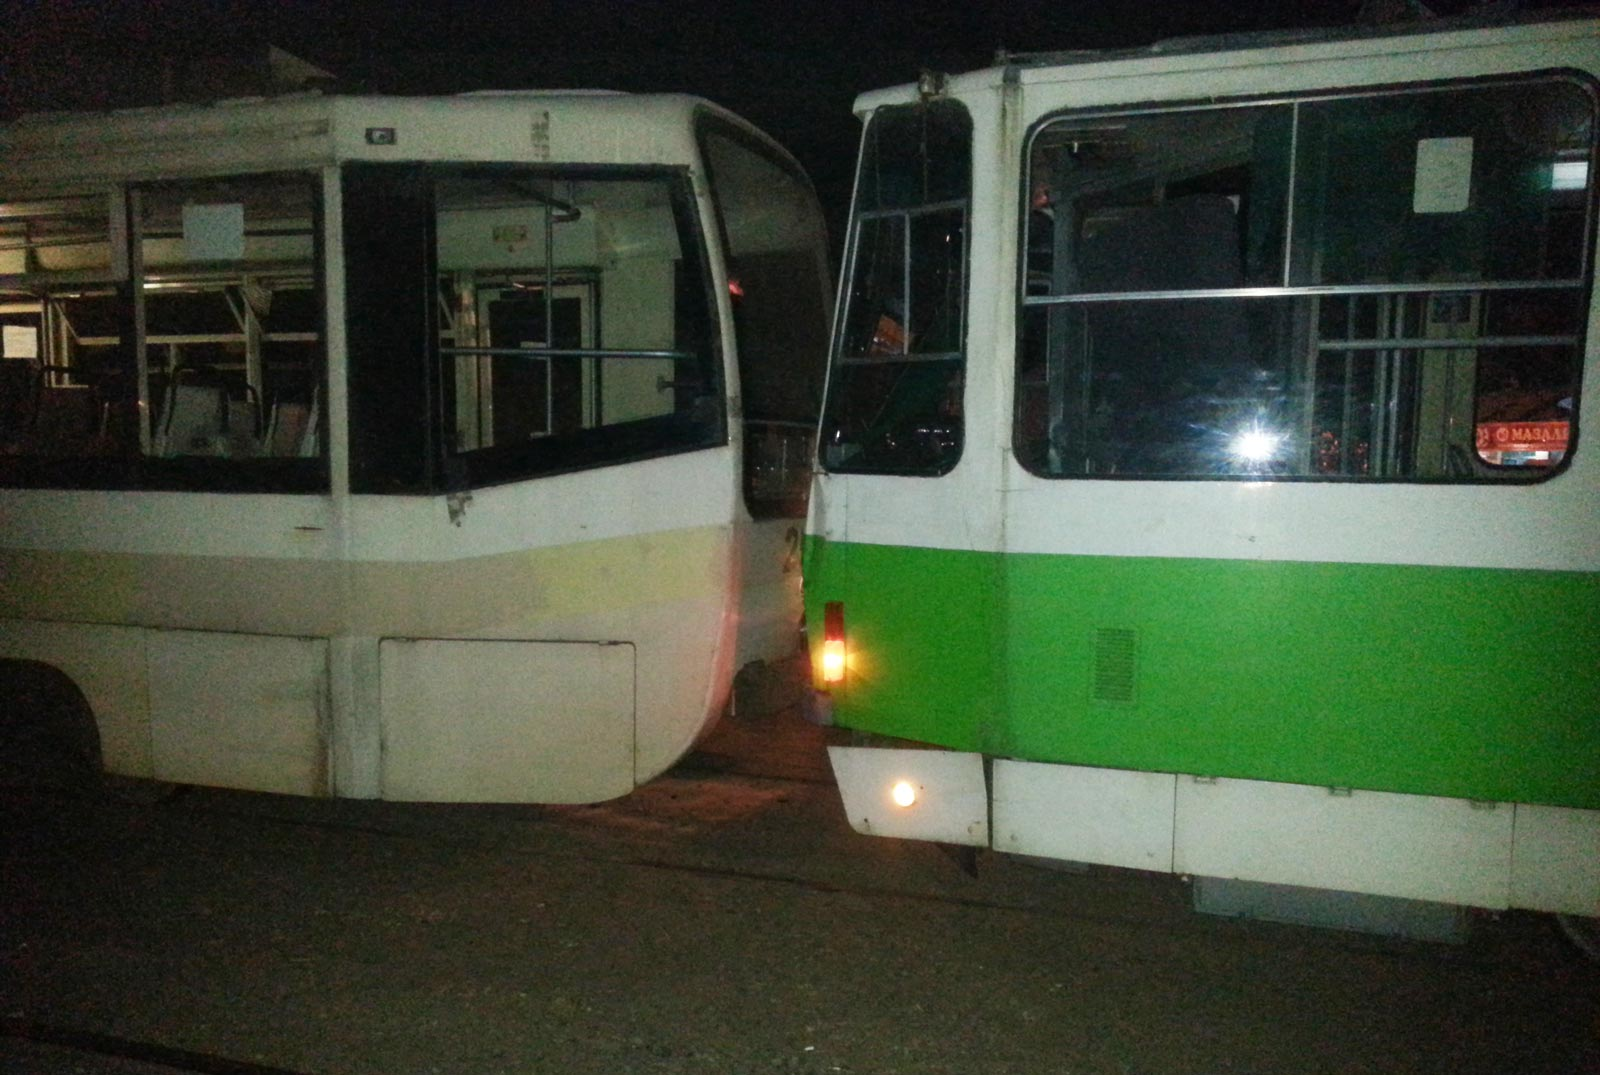 В Ташкенте произошло ДТП с участием трех трамваев (фото)